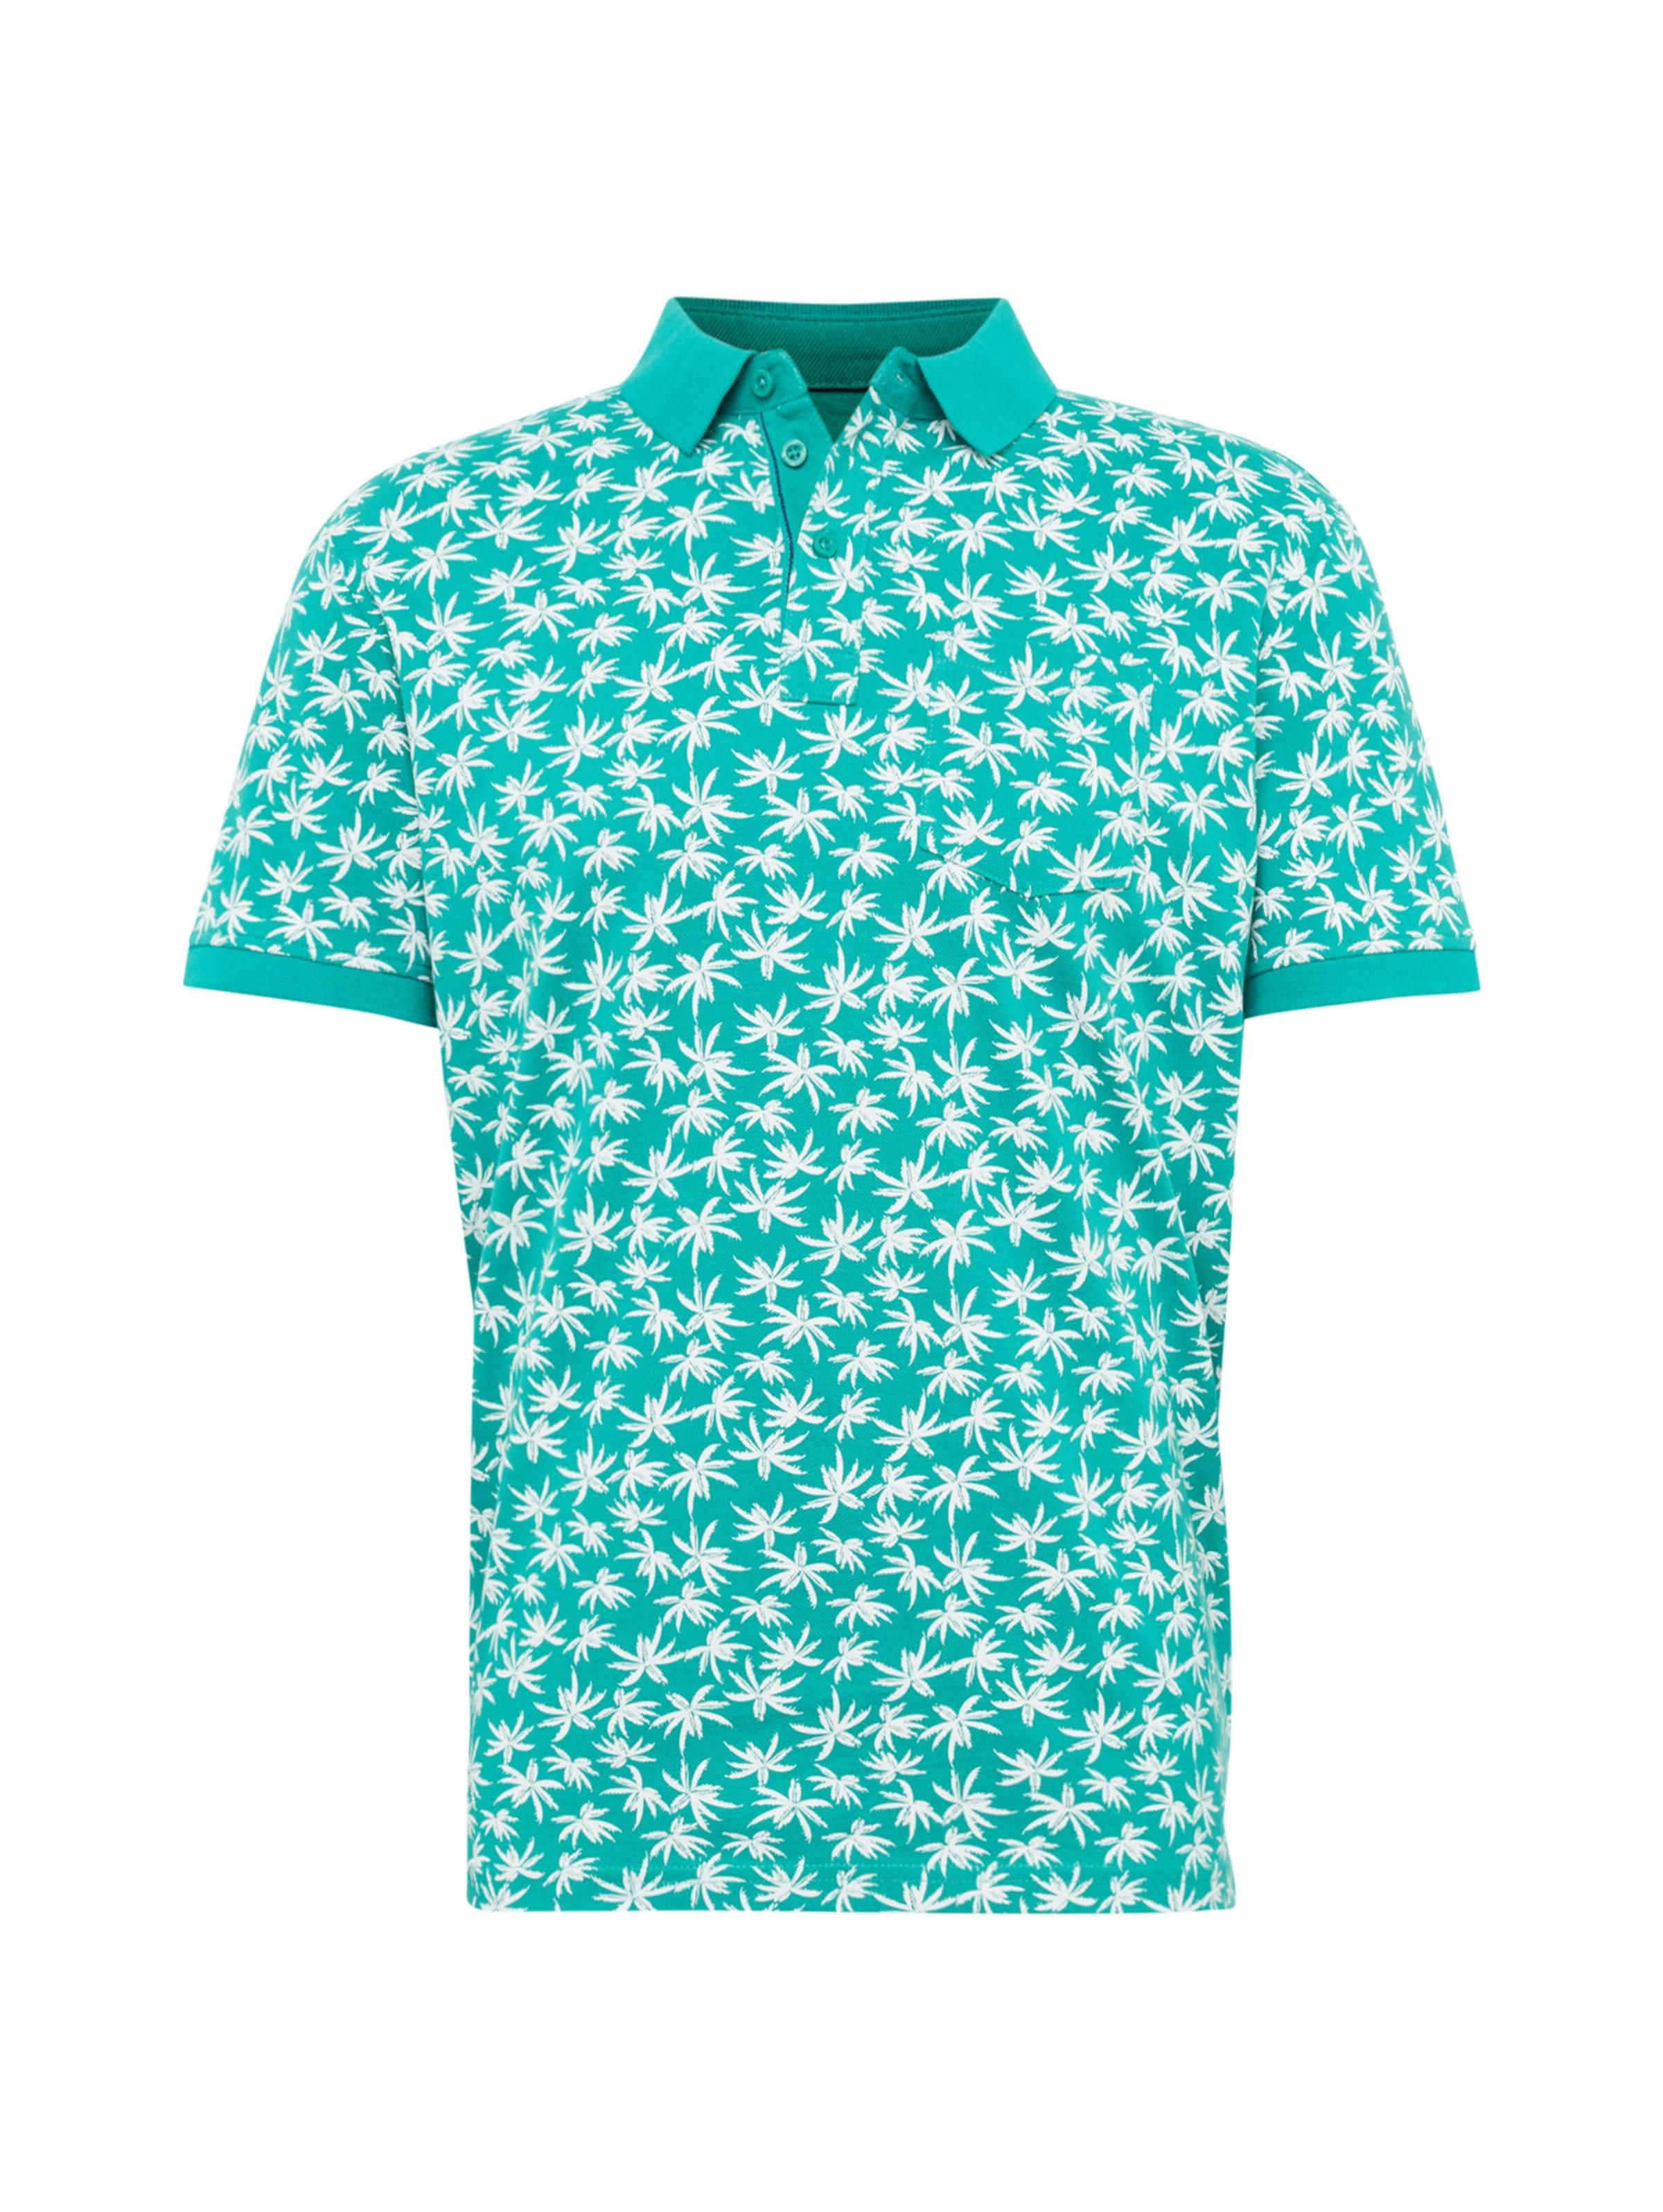 Tom Poloshirt In JadeWeiß Tailor Tailor Tom JadeWeiß In Poloshirt Tom Poloshirt Tailor In kiuXPZ